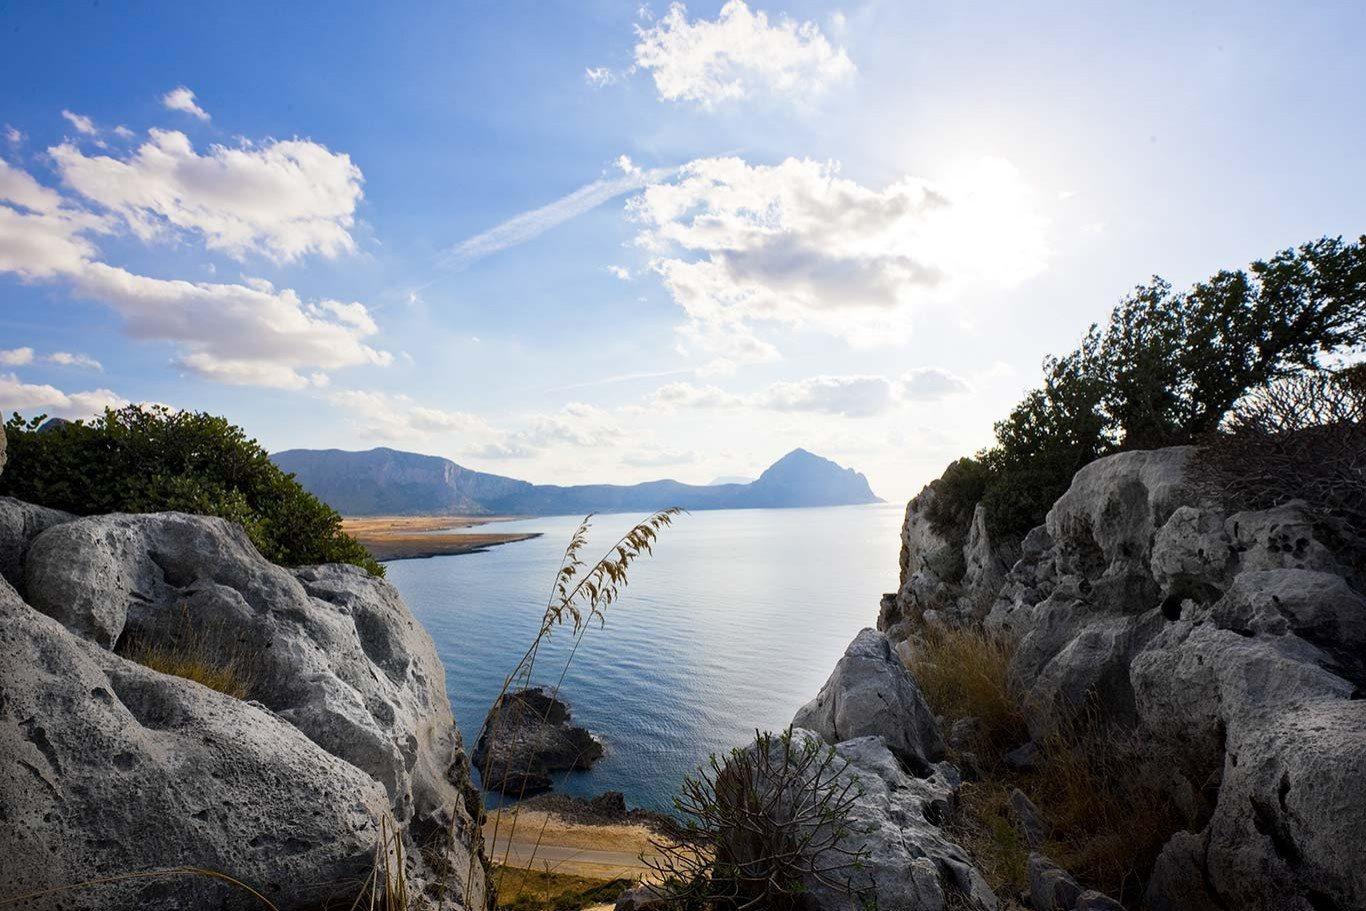 Vista dal monte Cofano